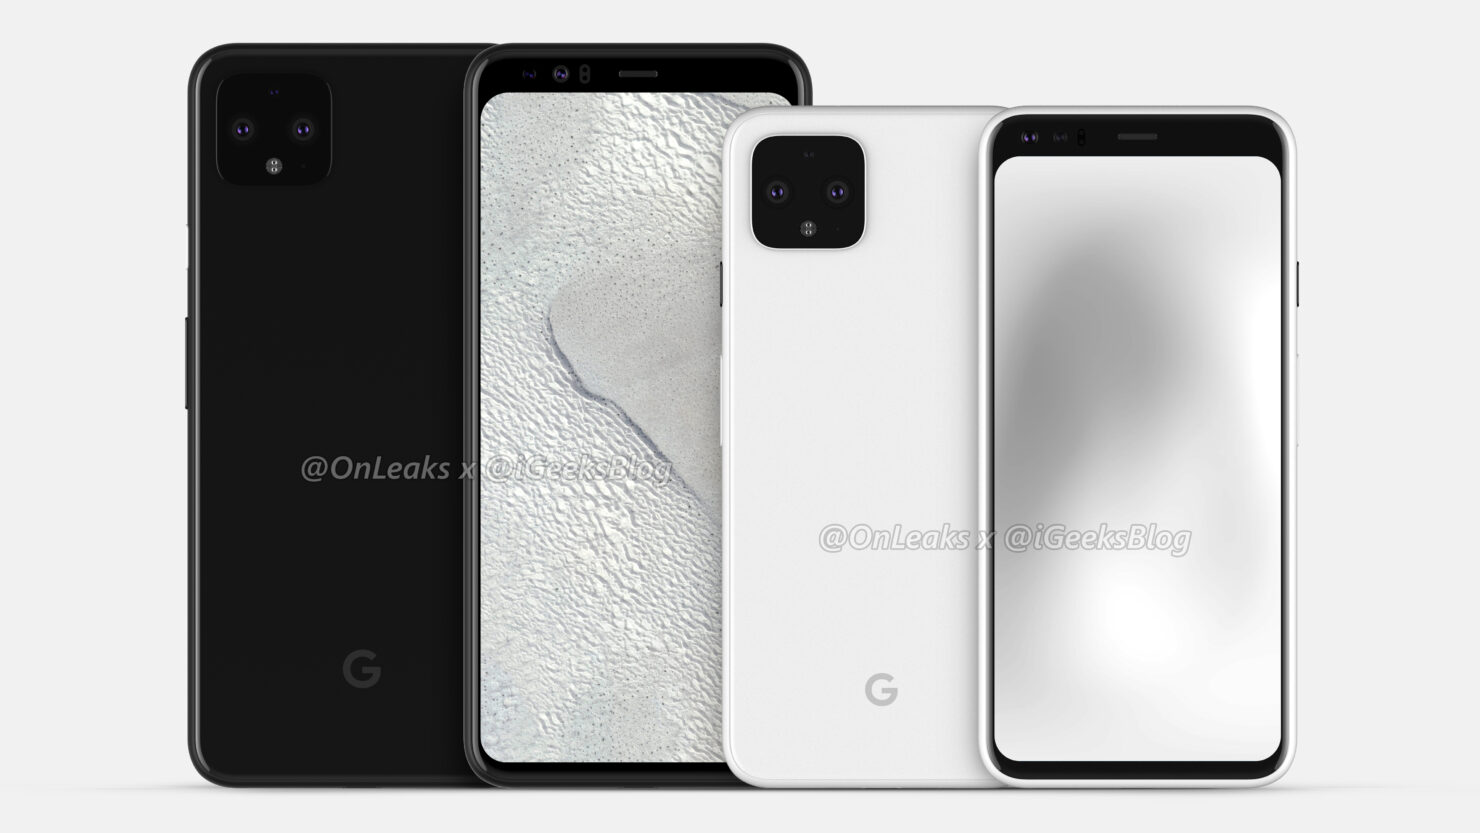 pixel4-vs-pixel-4-leaked-image